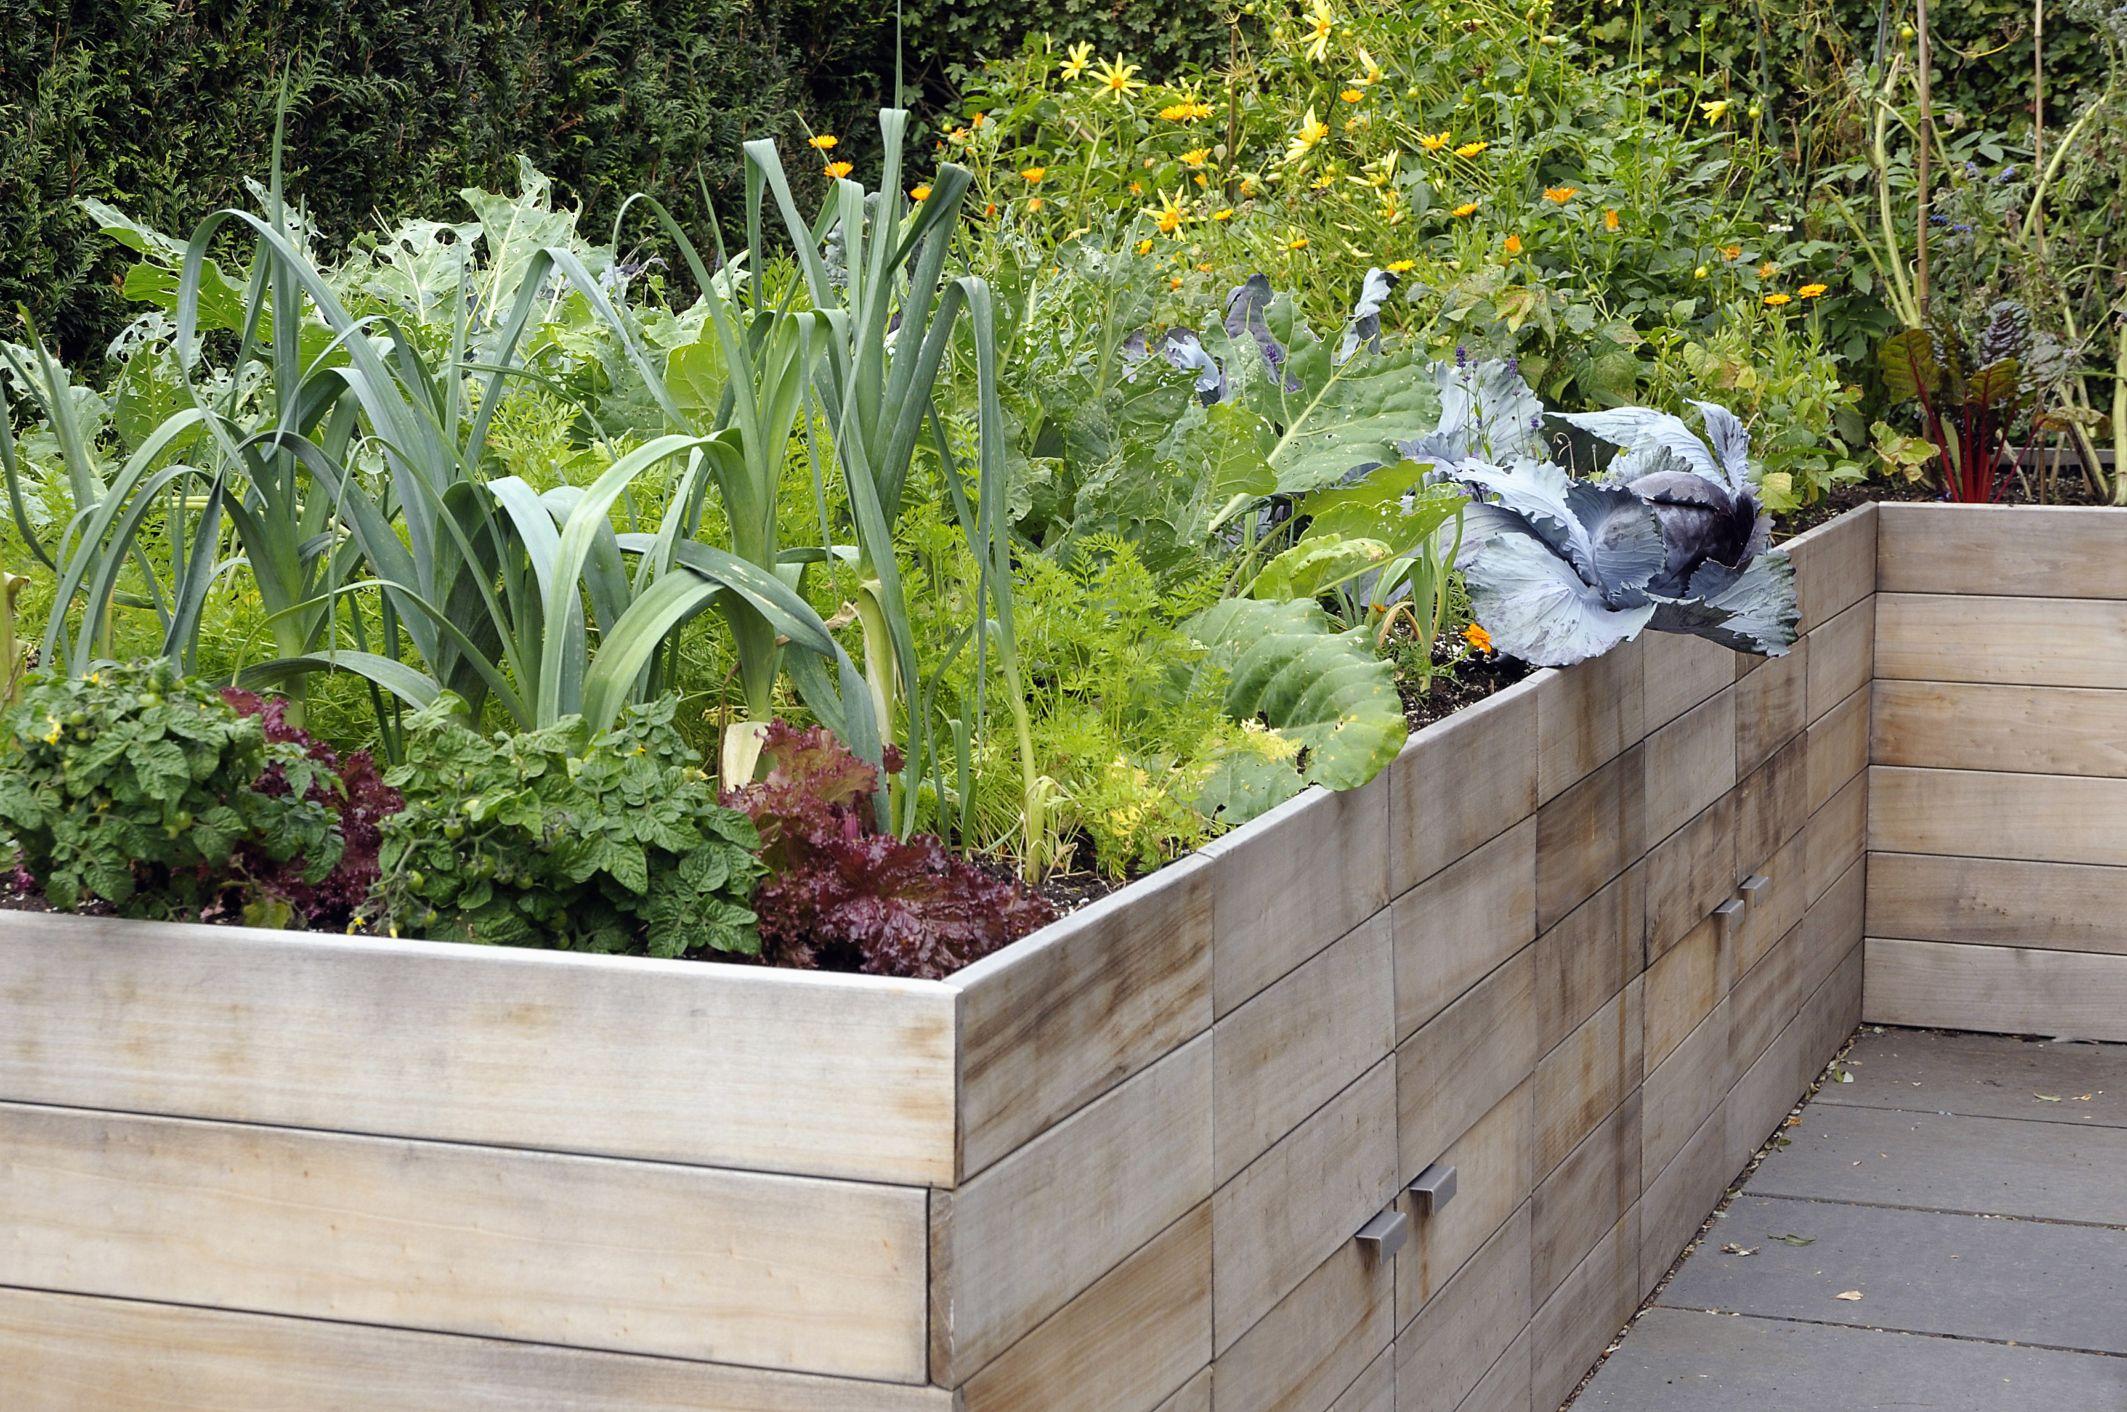 How To Build A Raised Garden Bed Diy Container Garden